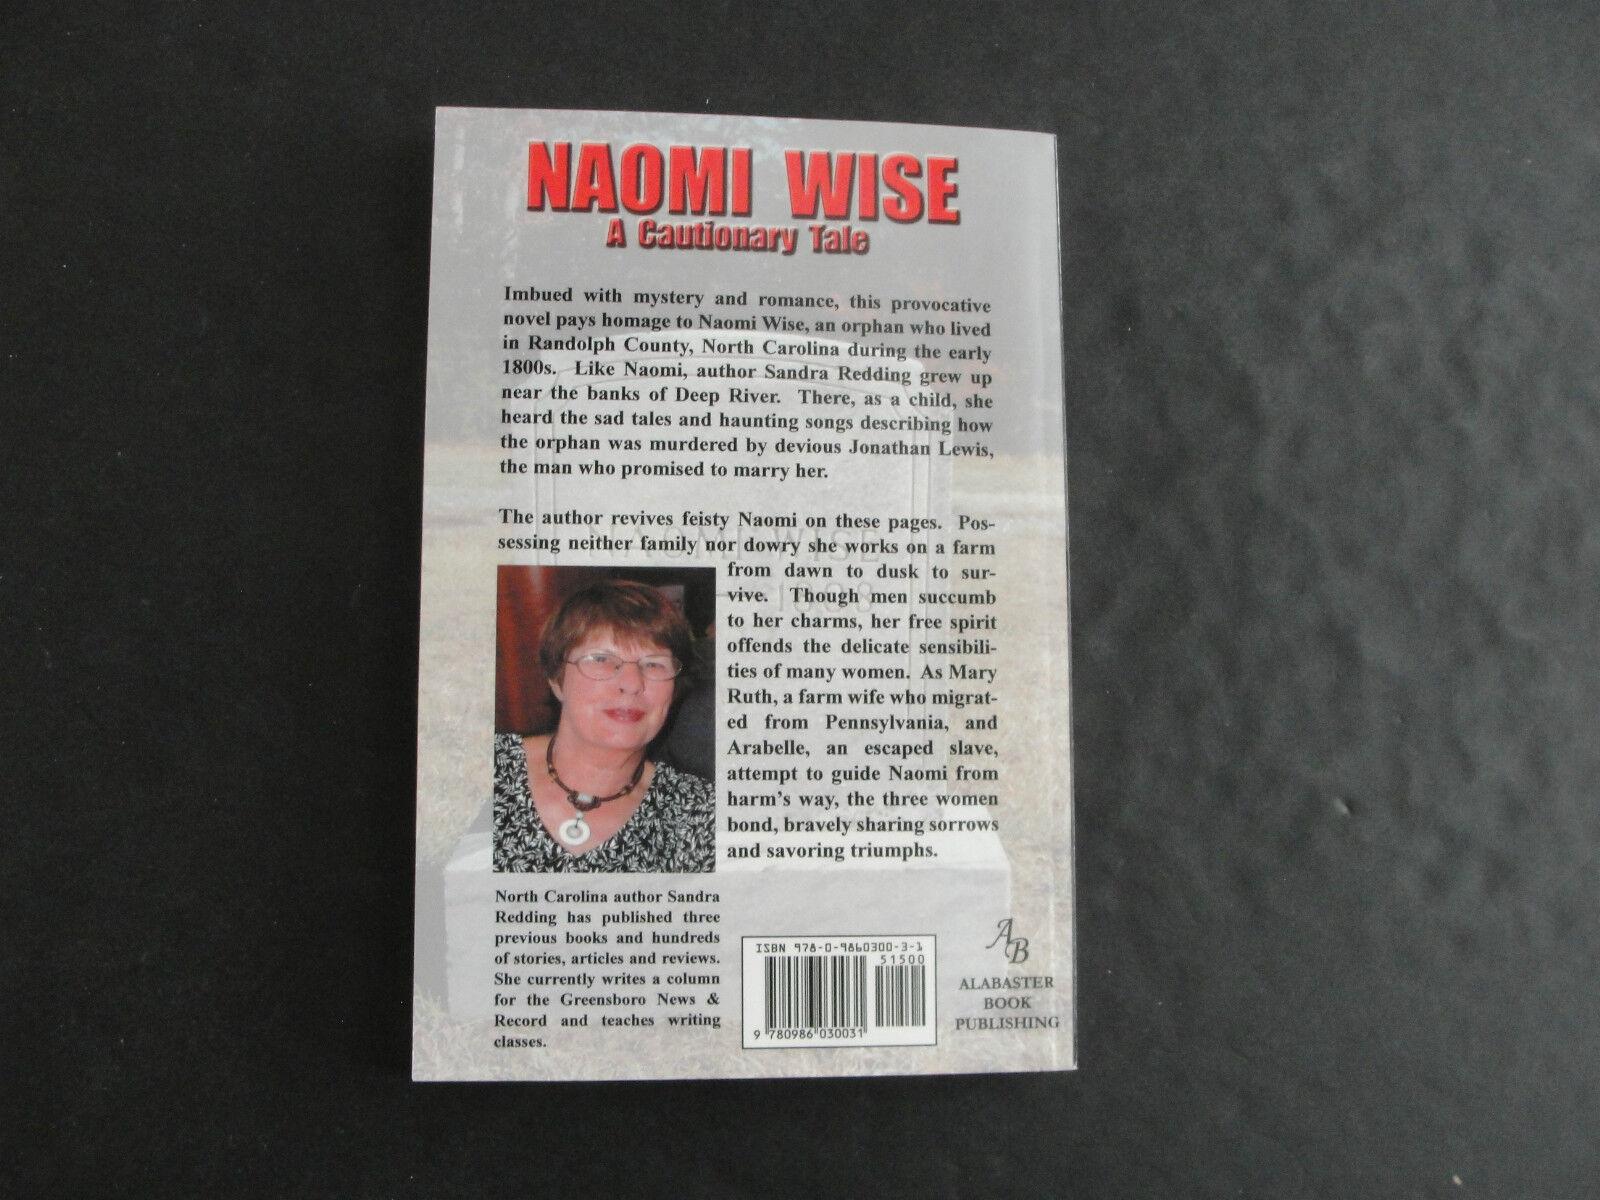 Naomi Wise: A Cautionary Tale